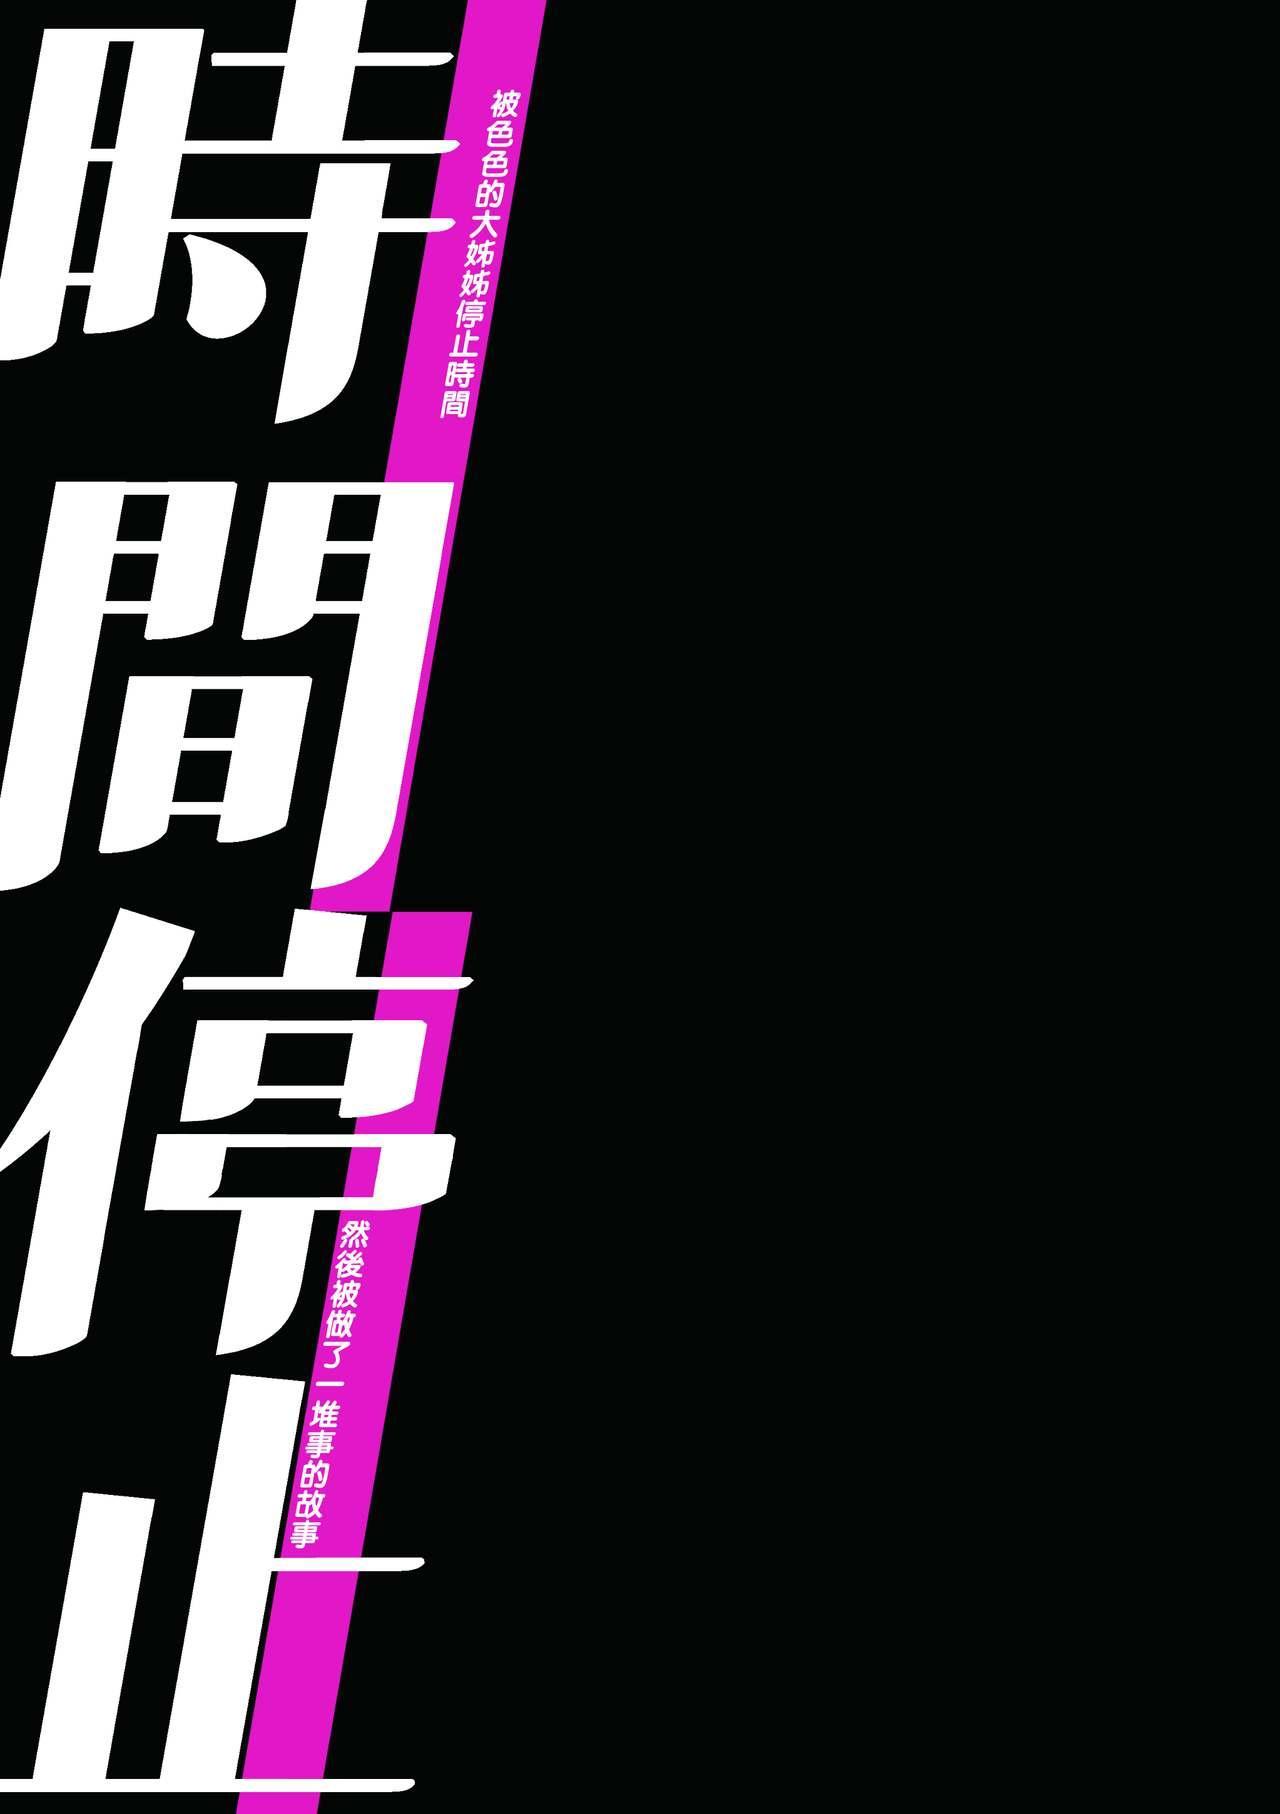 [Mushaburu (Musha Sabu)] Jikan Teishi - Kuuhaku no Kioku   時間停止 - 空白的記憶 [Chinese] [漢化組漢化組] [Digital] 20